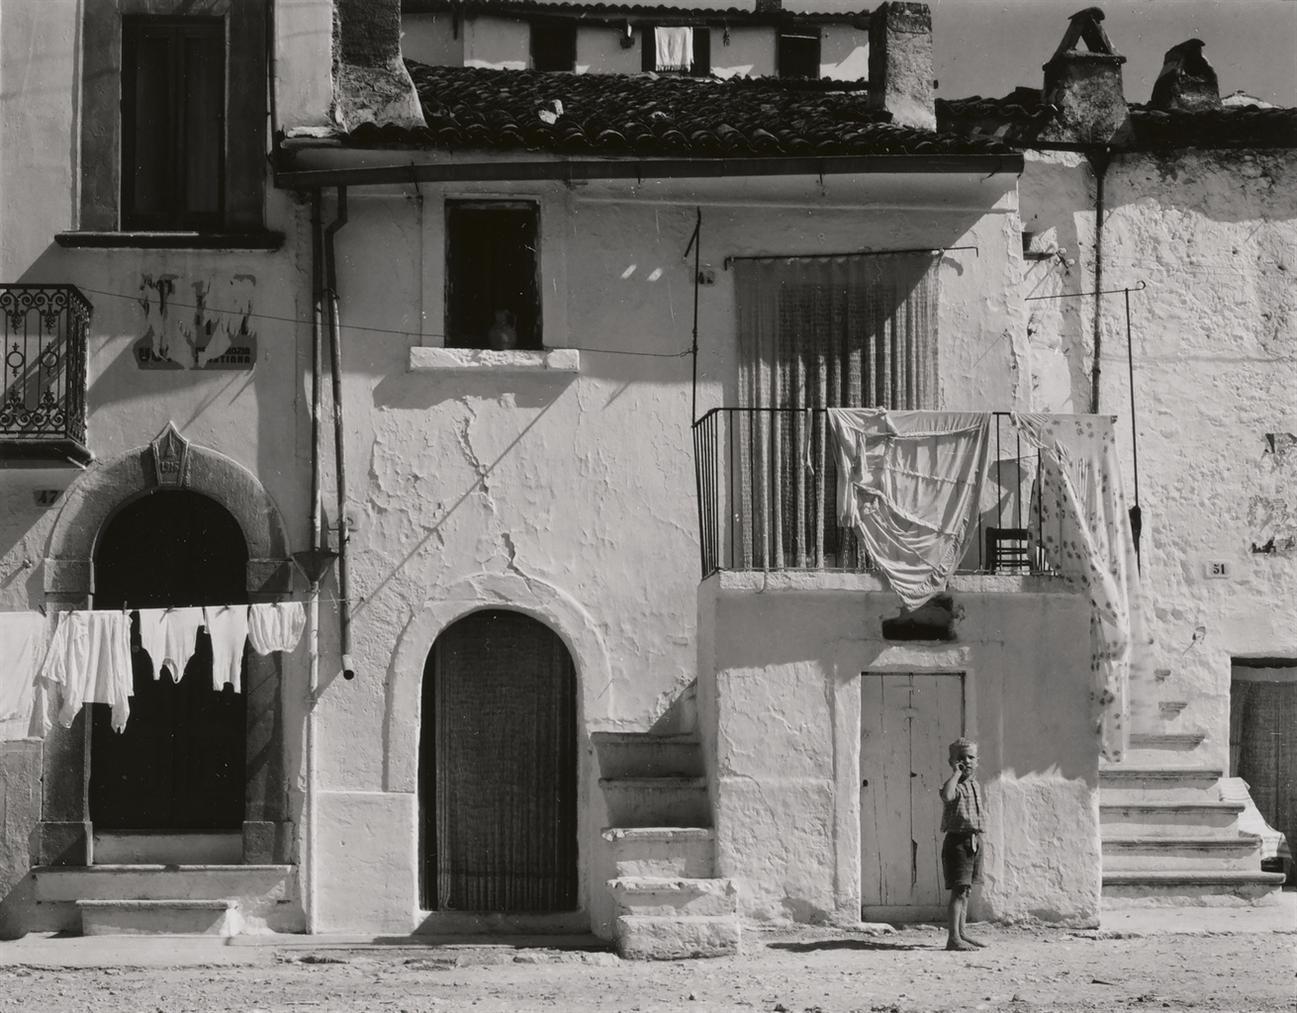 Paul Strand-Town In The Gargano II, Italy-1952